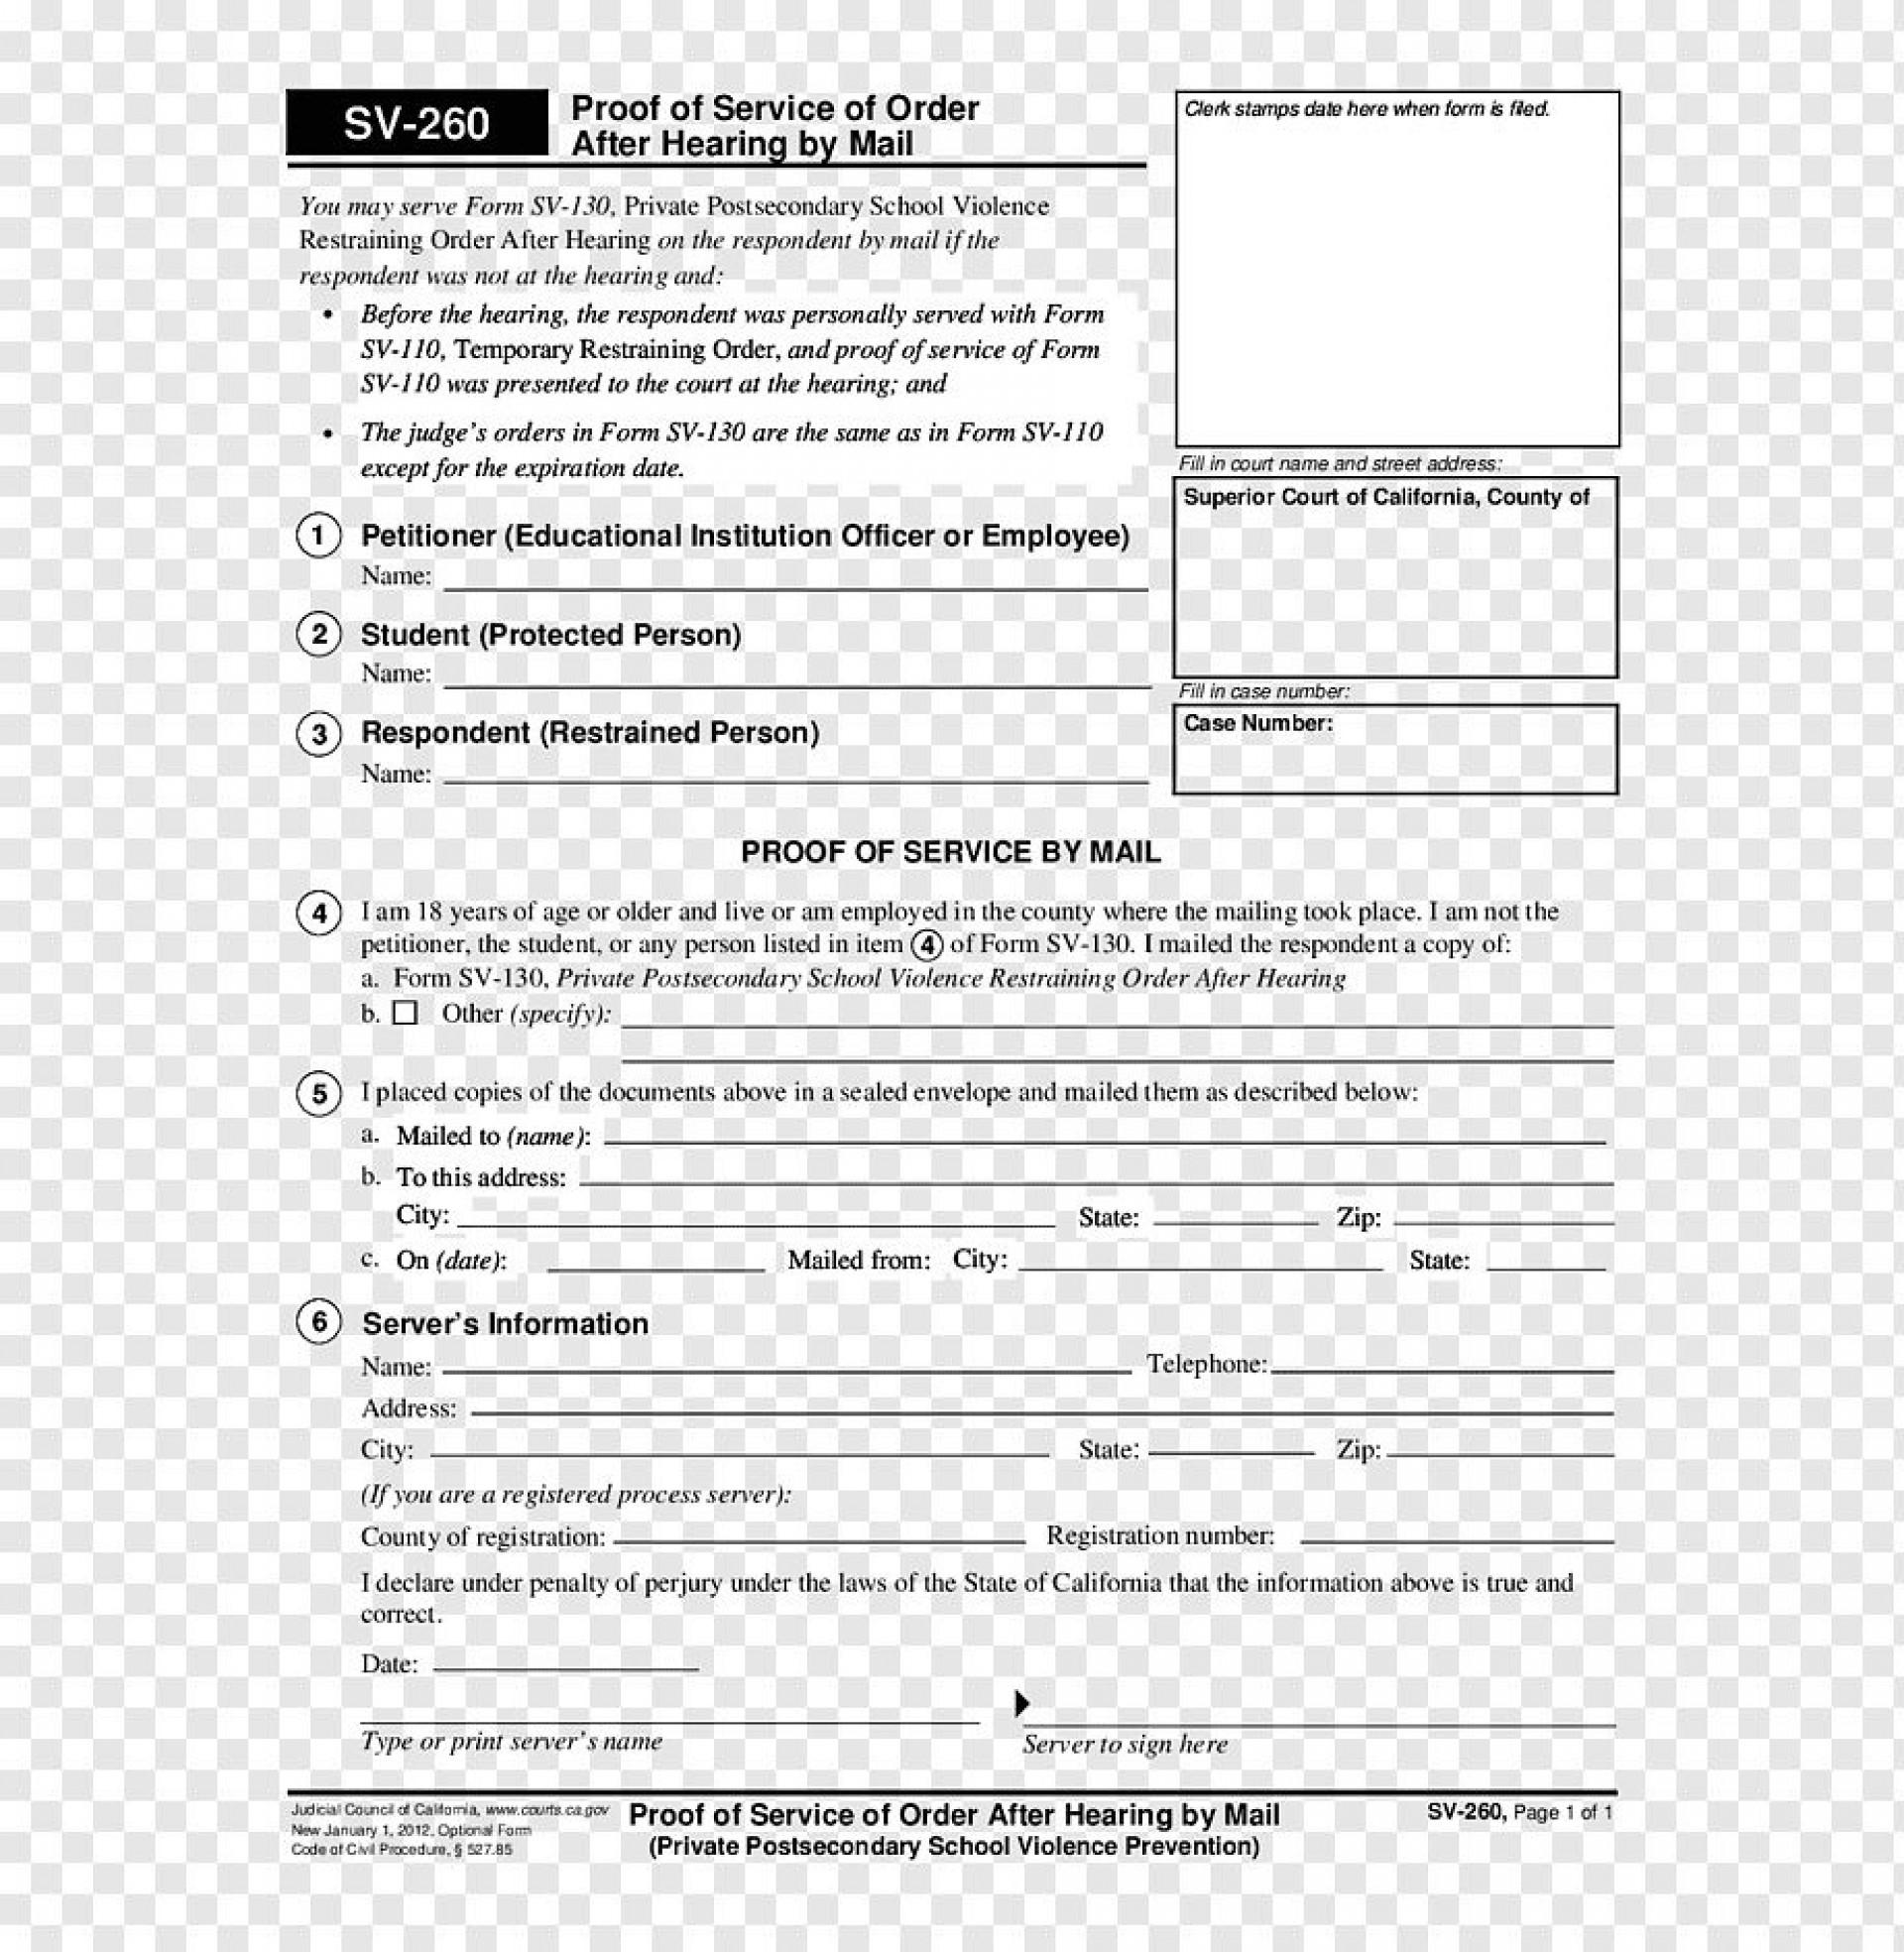 008 Excellent Microsoft Word Wedding Program Template Image  Templates Free Downloadable Reception Editable Printable1920